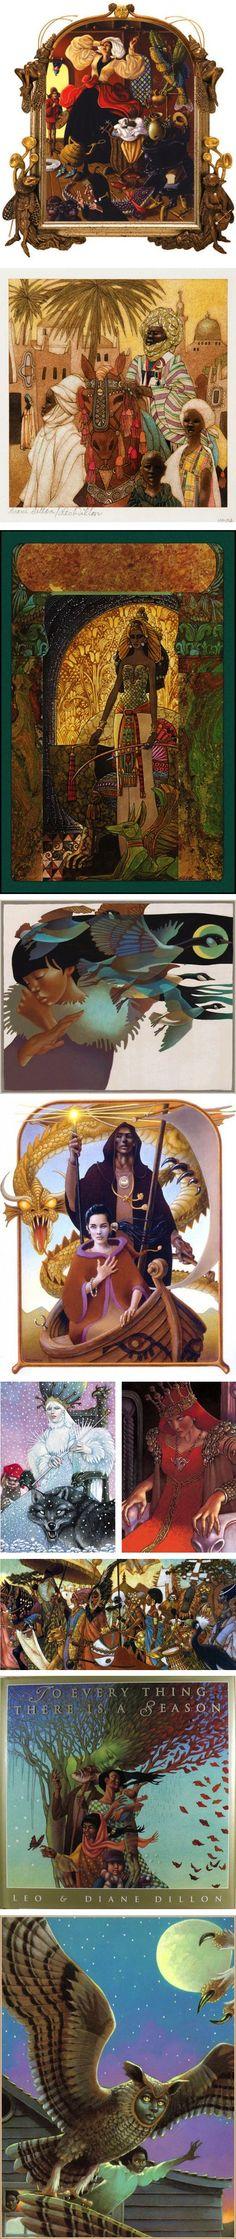 "Leo and Diane Dillon - ""Illustration compilation (via linesandcolors)"""